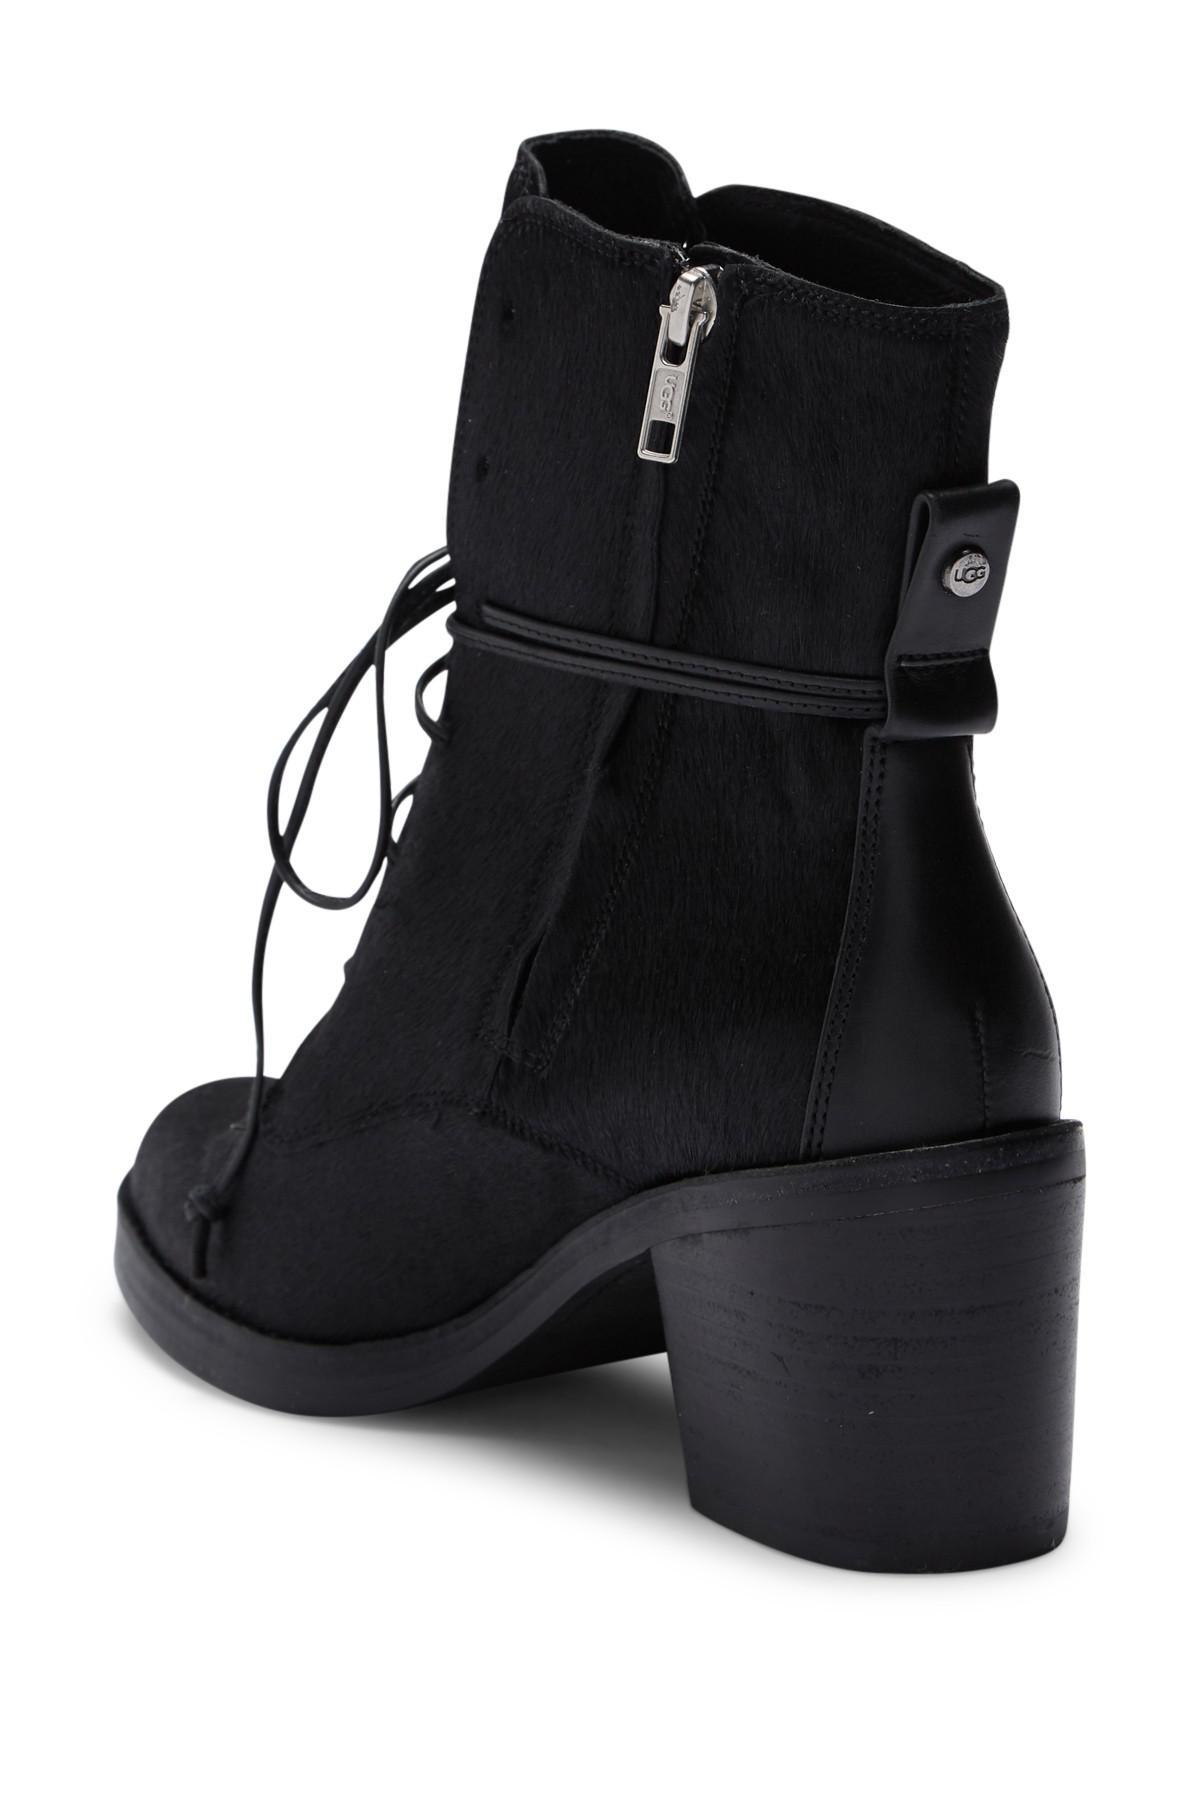 2a65bd0bc94 Ugg Black Oriana Exotic Genuine Calf Hair Block Heel Boot